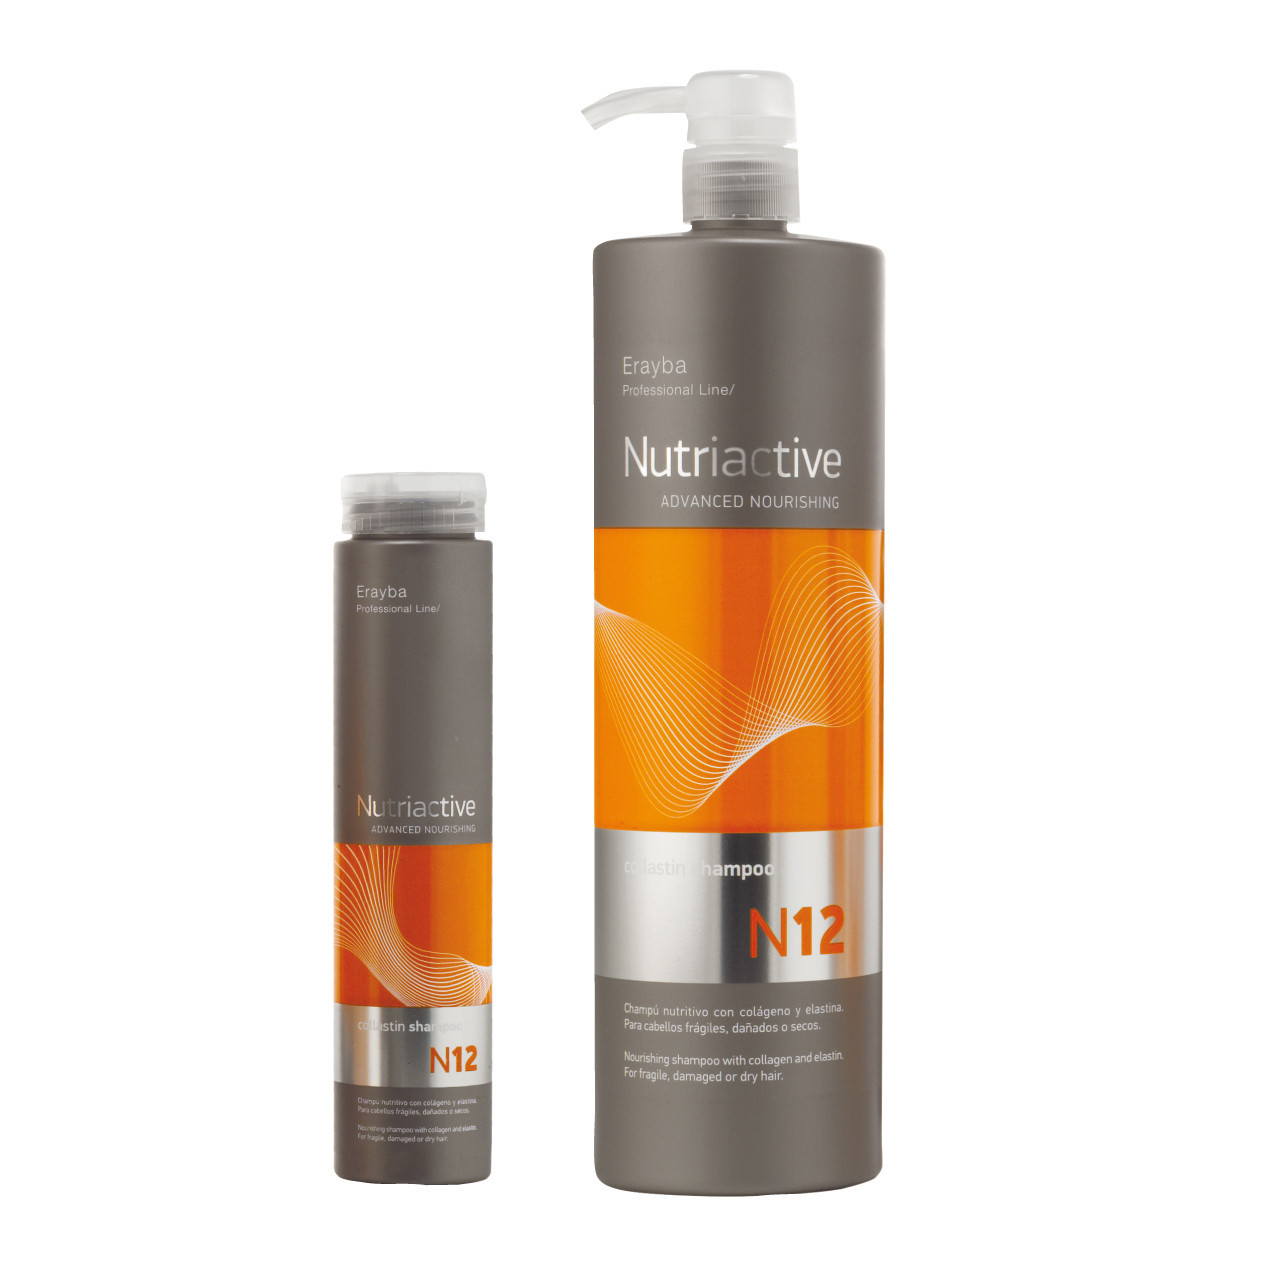 Питательный шампунь с коллагеном и эластином Erayba Collastin Shampoo N12 1000 мл